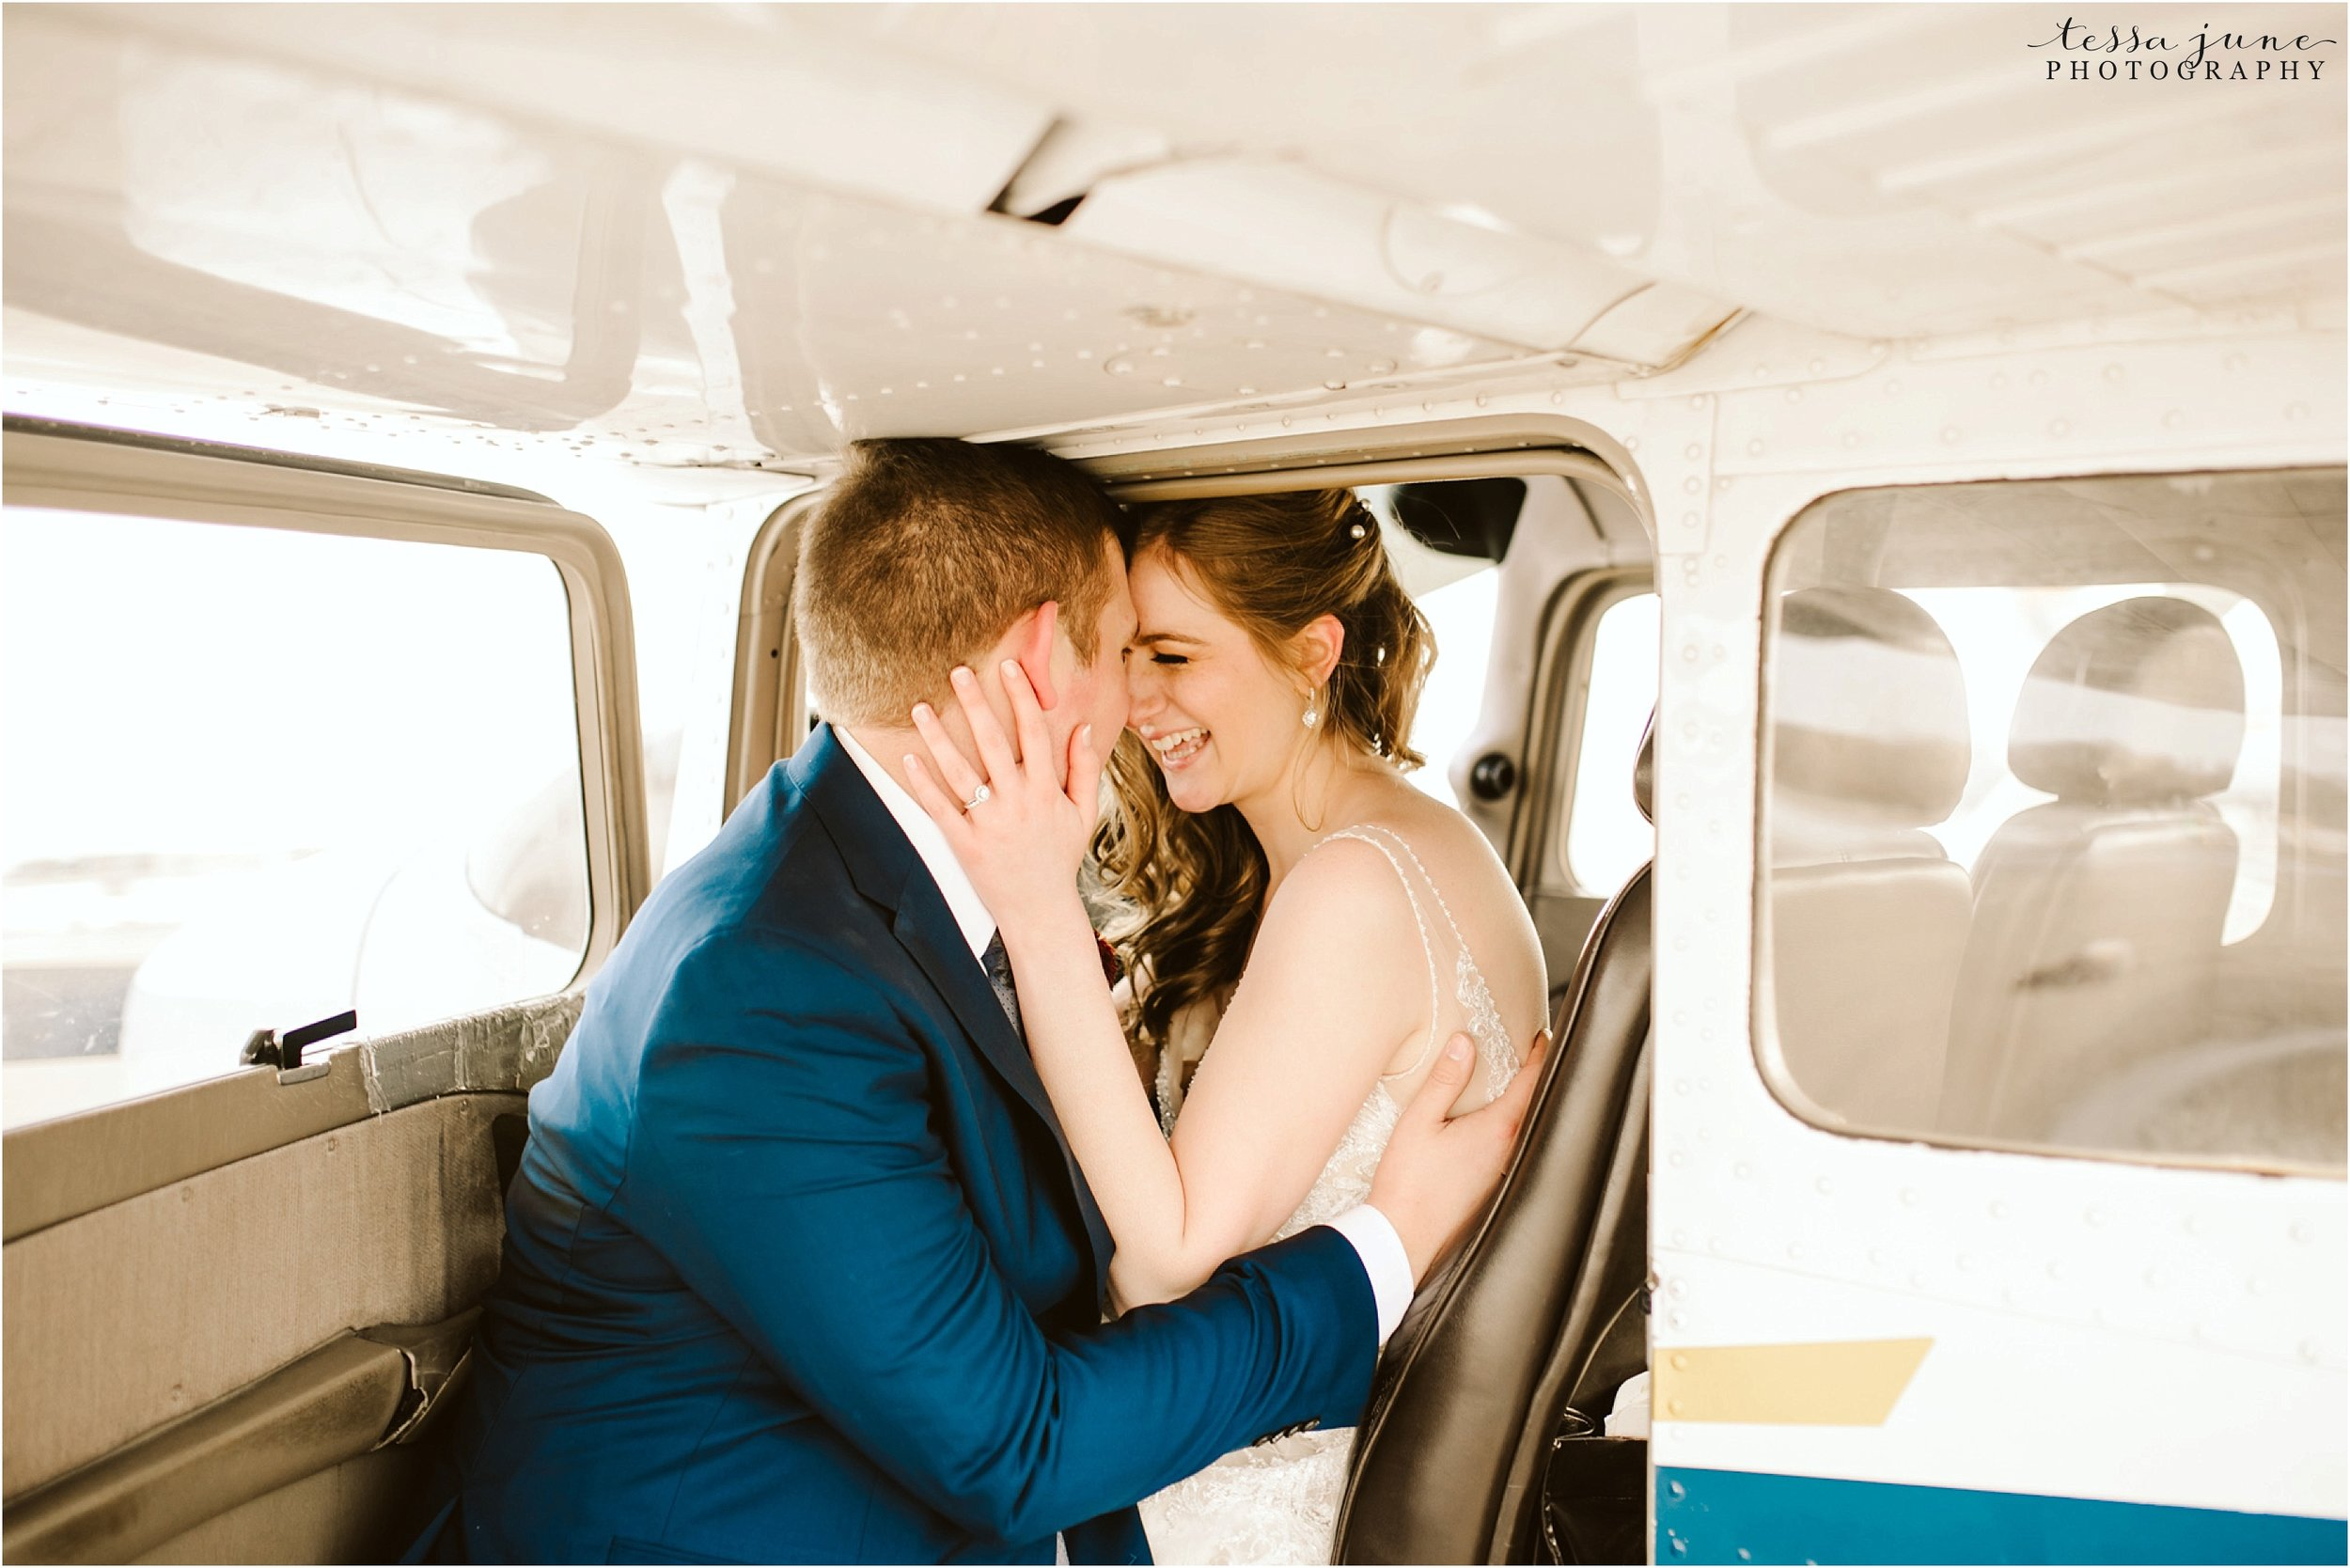 winter-wedding-in-eden-prairie-barn-minnesota-airplane-118.jpg